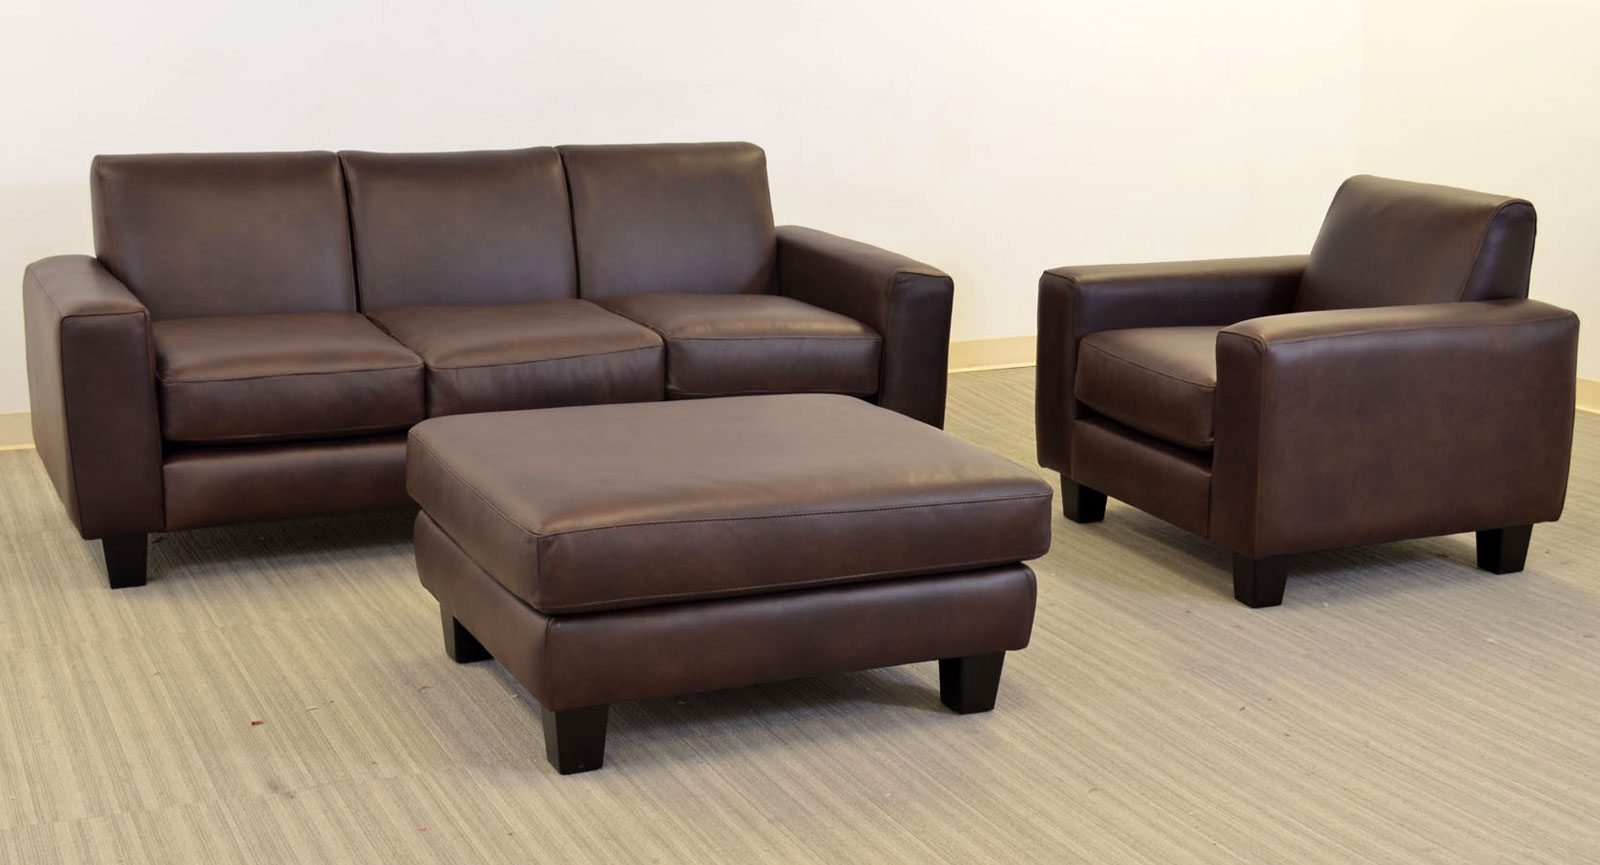 Elegante Sofas elegante sofa the leather sofa company